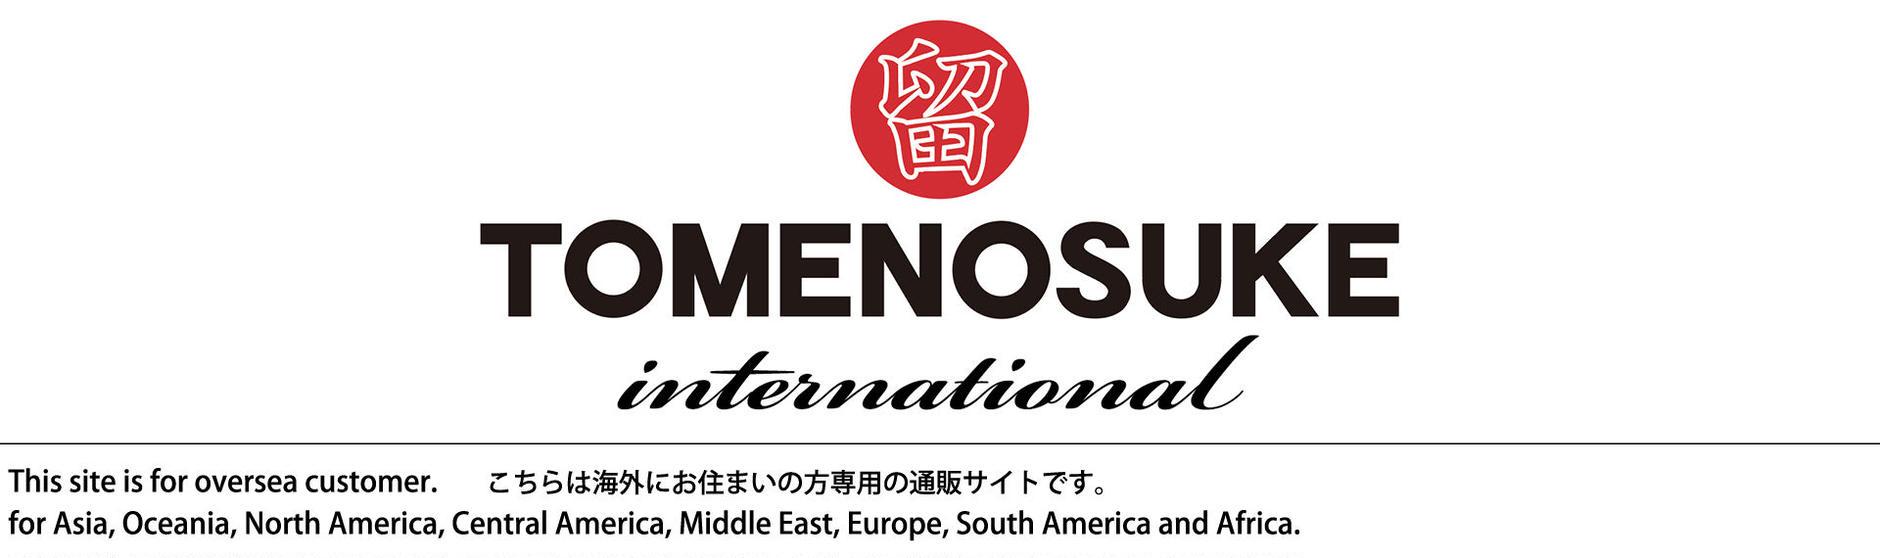 Tomenosuke International